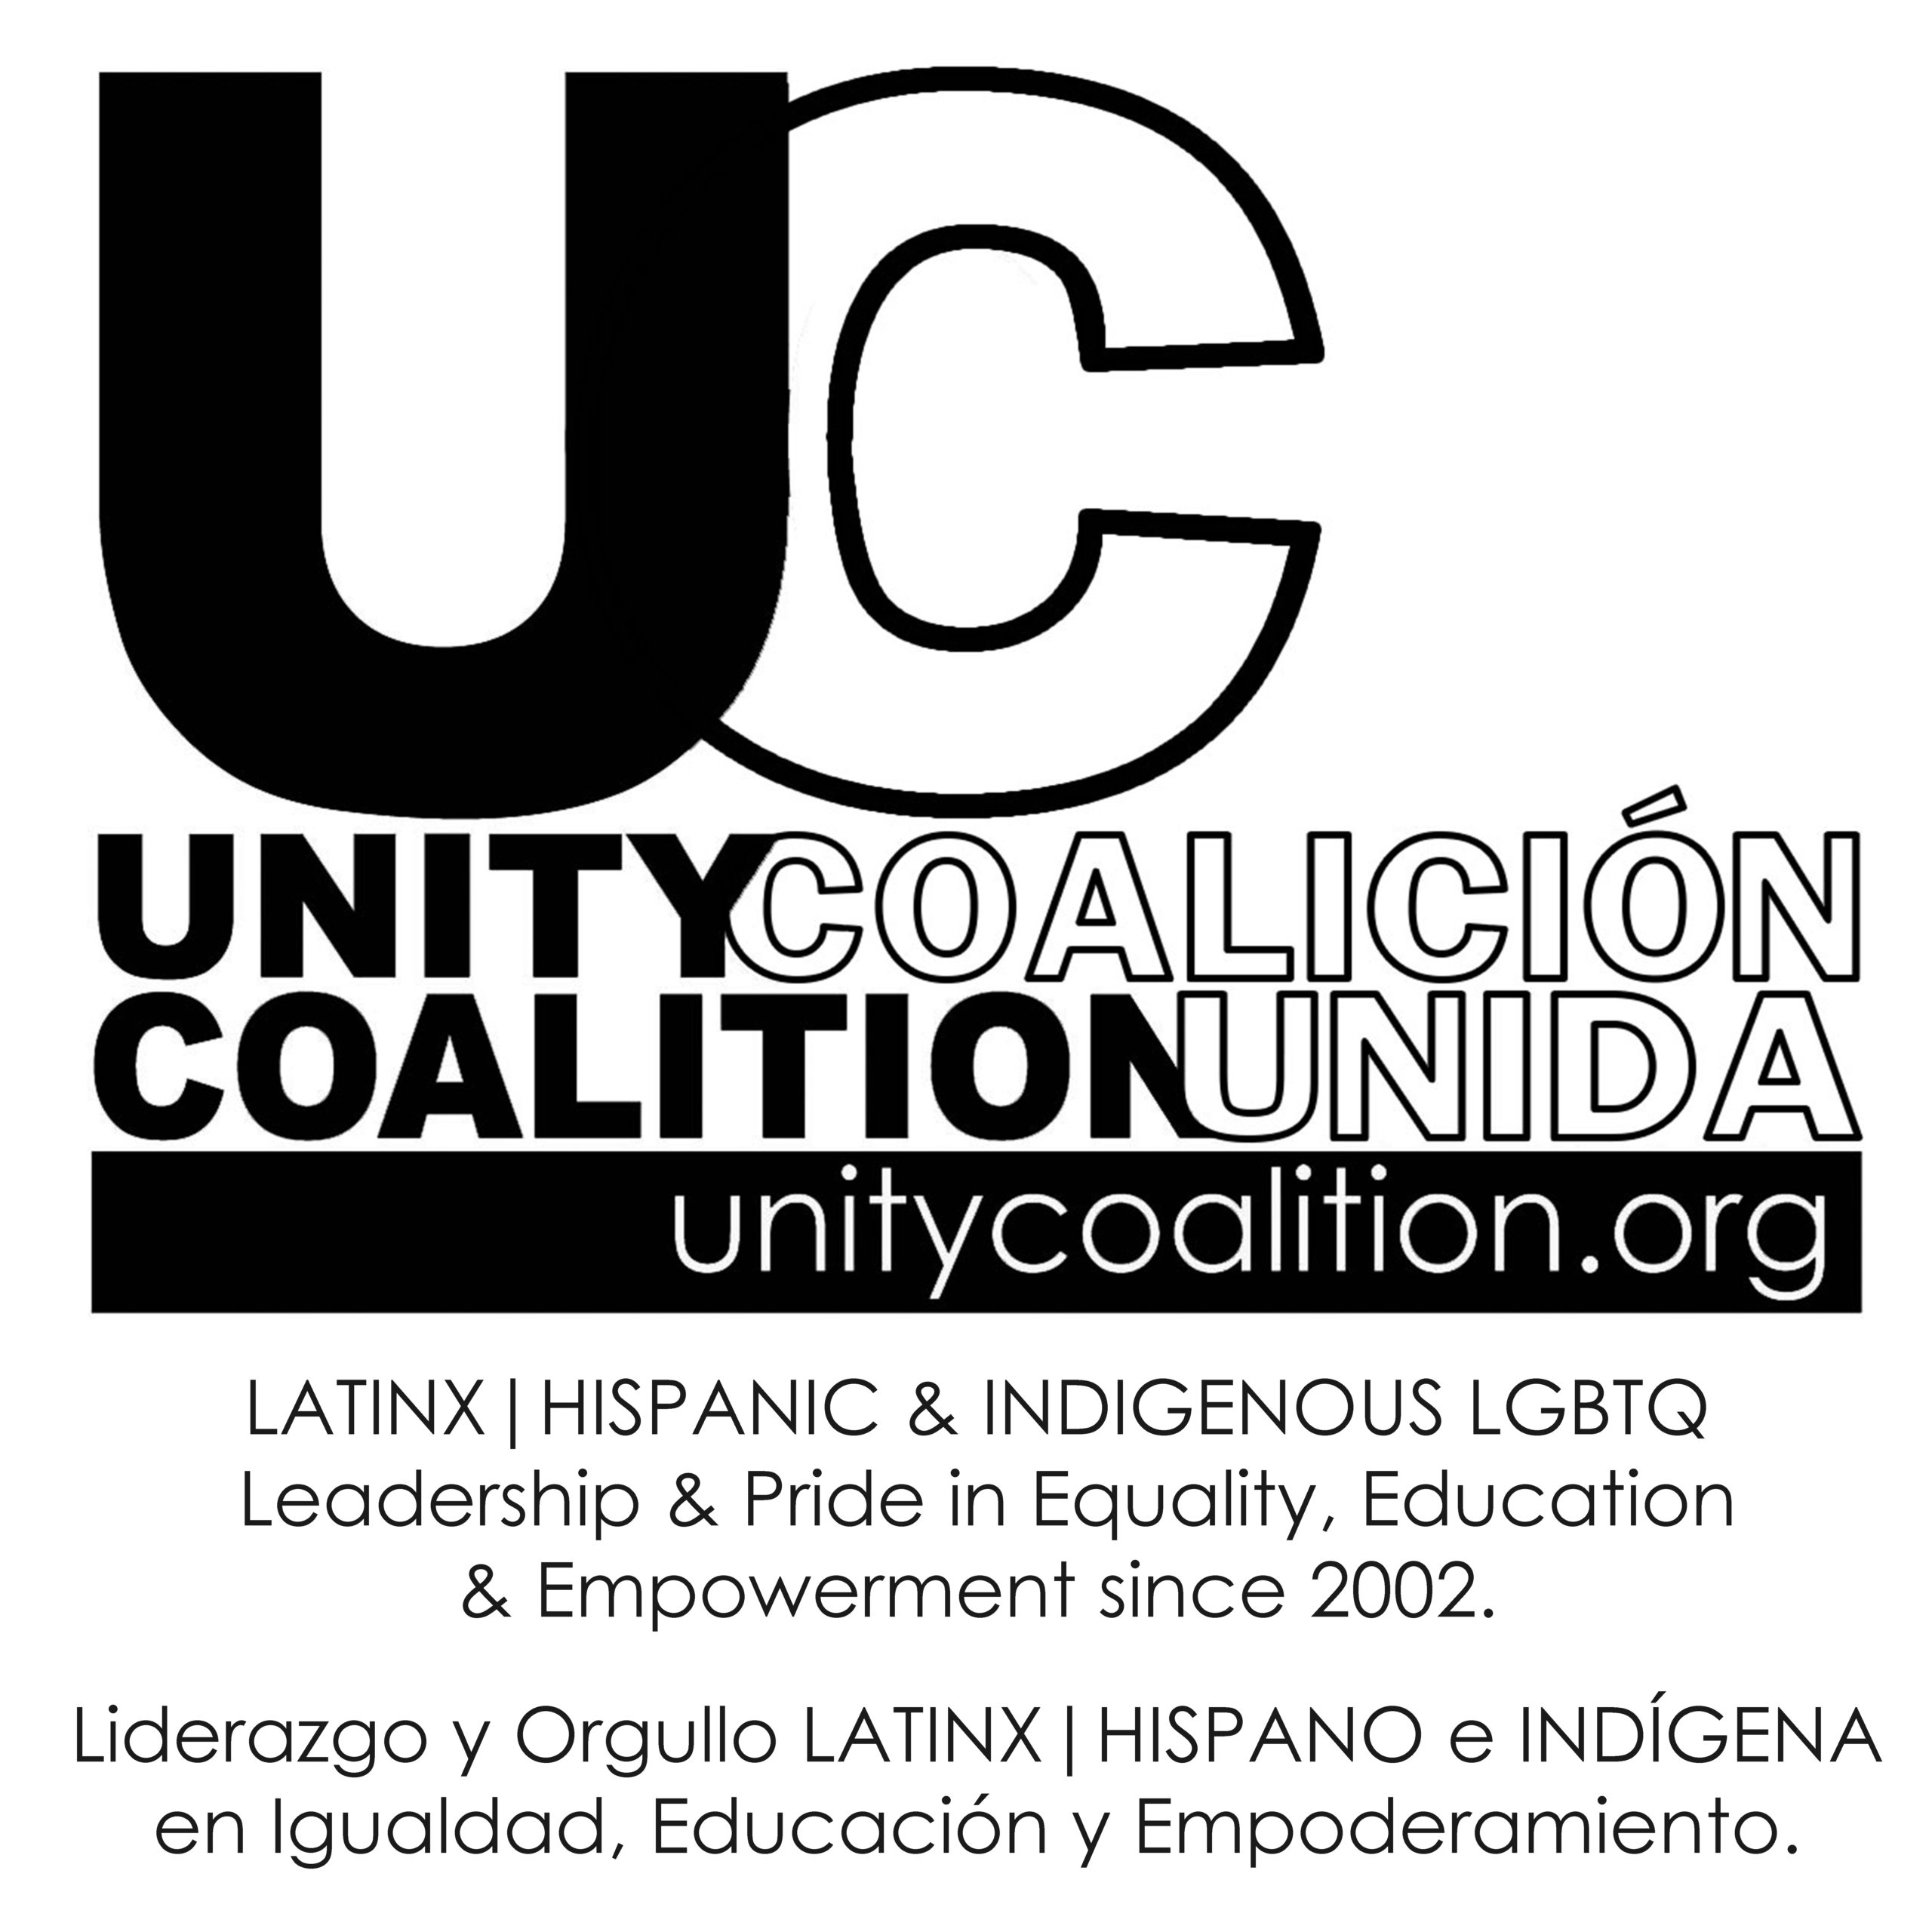 Unity Coalition|Coalicion Unida, Inc.